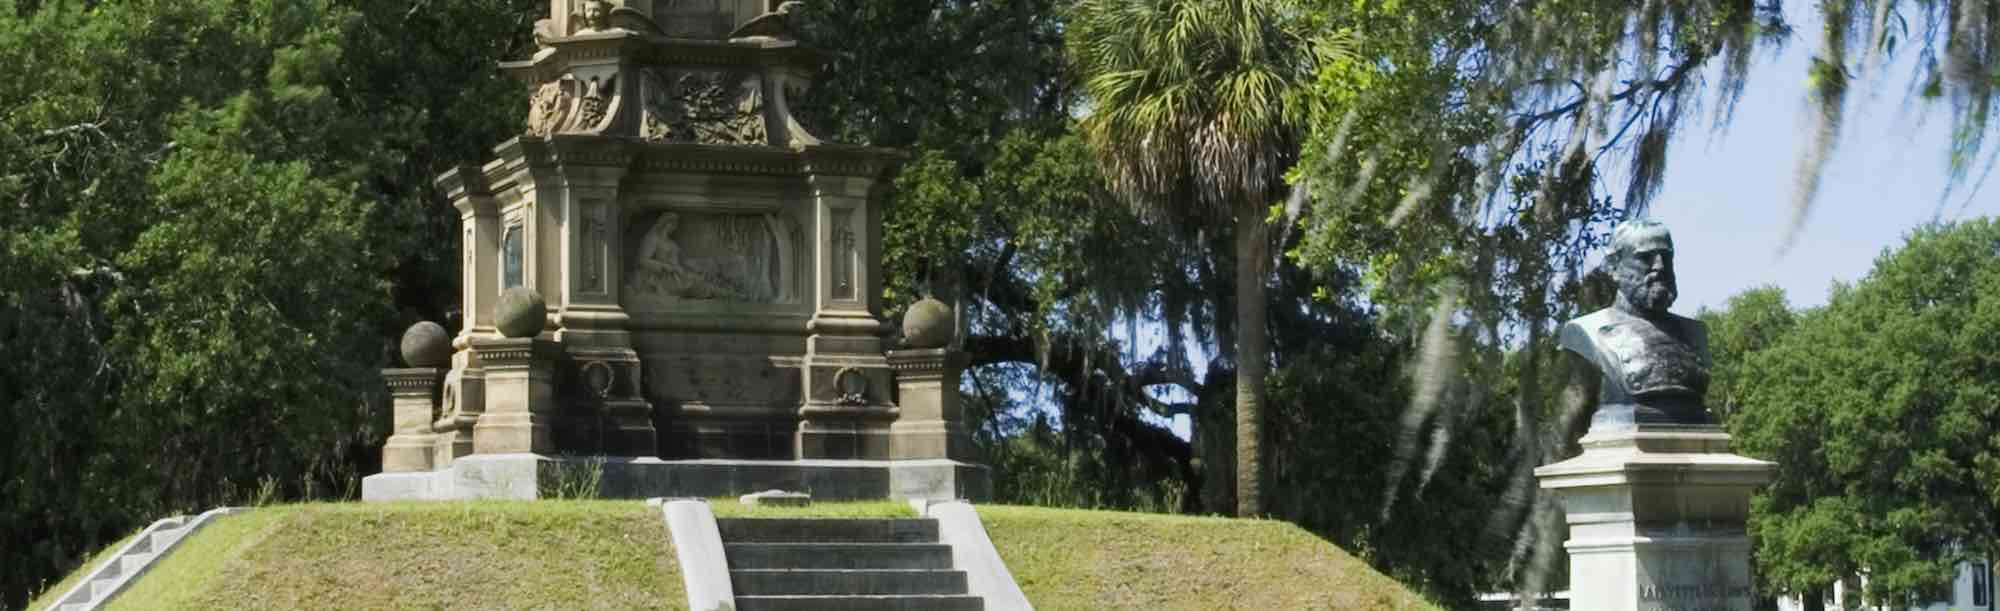 The Confederate Monument in Forsyth Park, Savannah, GA.